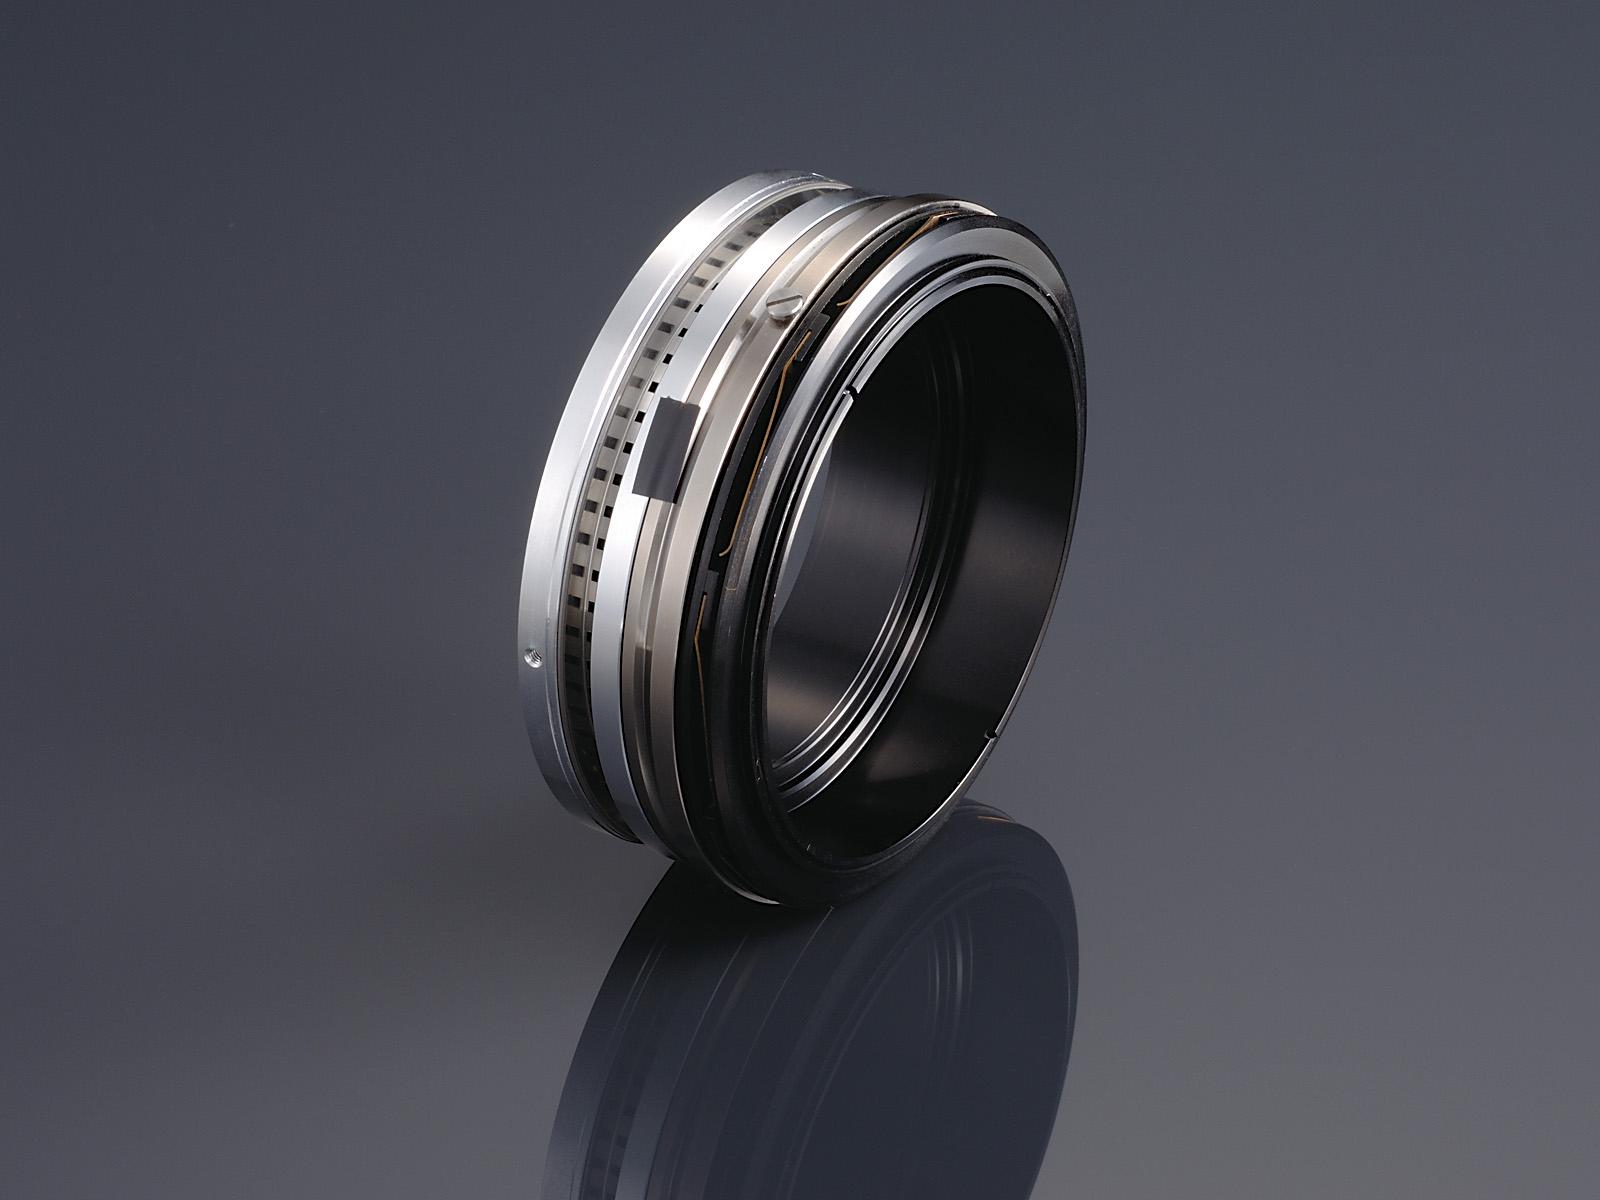 AF-S 200mm F2, 300mm F2.8, 400mm F2.8, 500mm F4, 600mm F4, 200-400mm F4